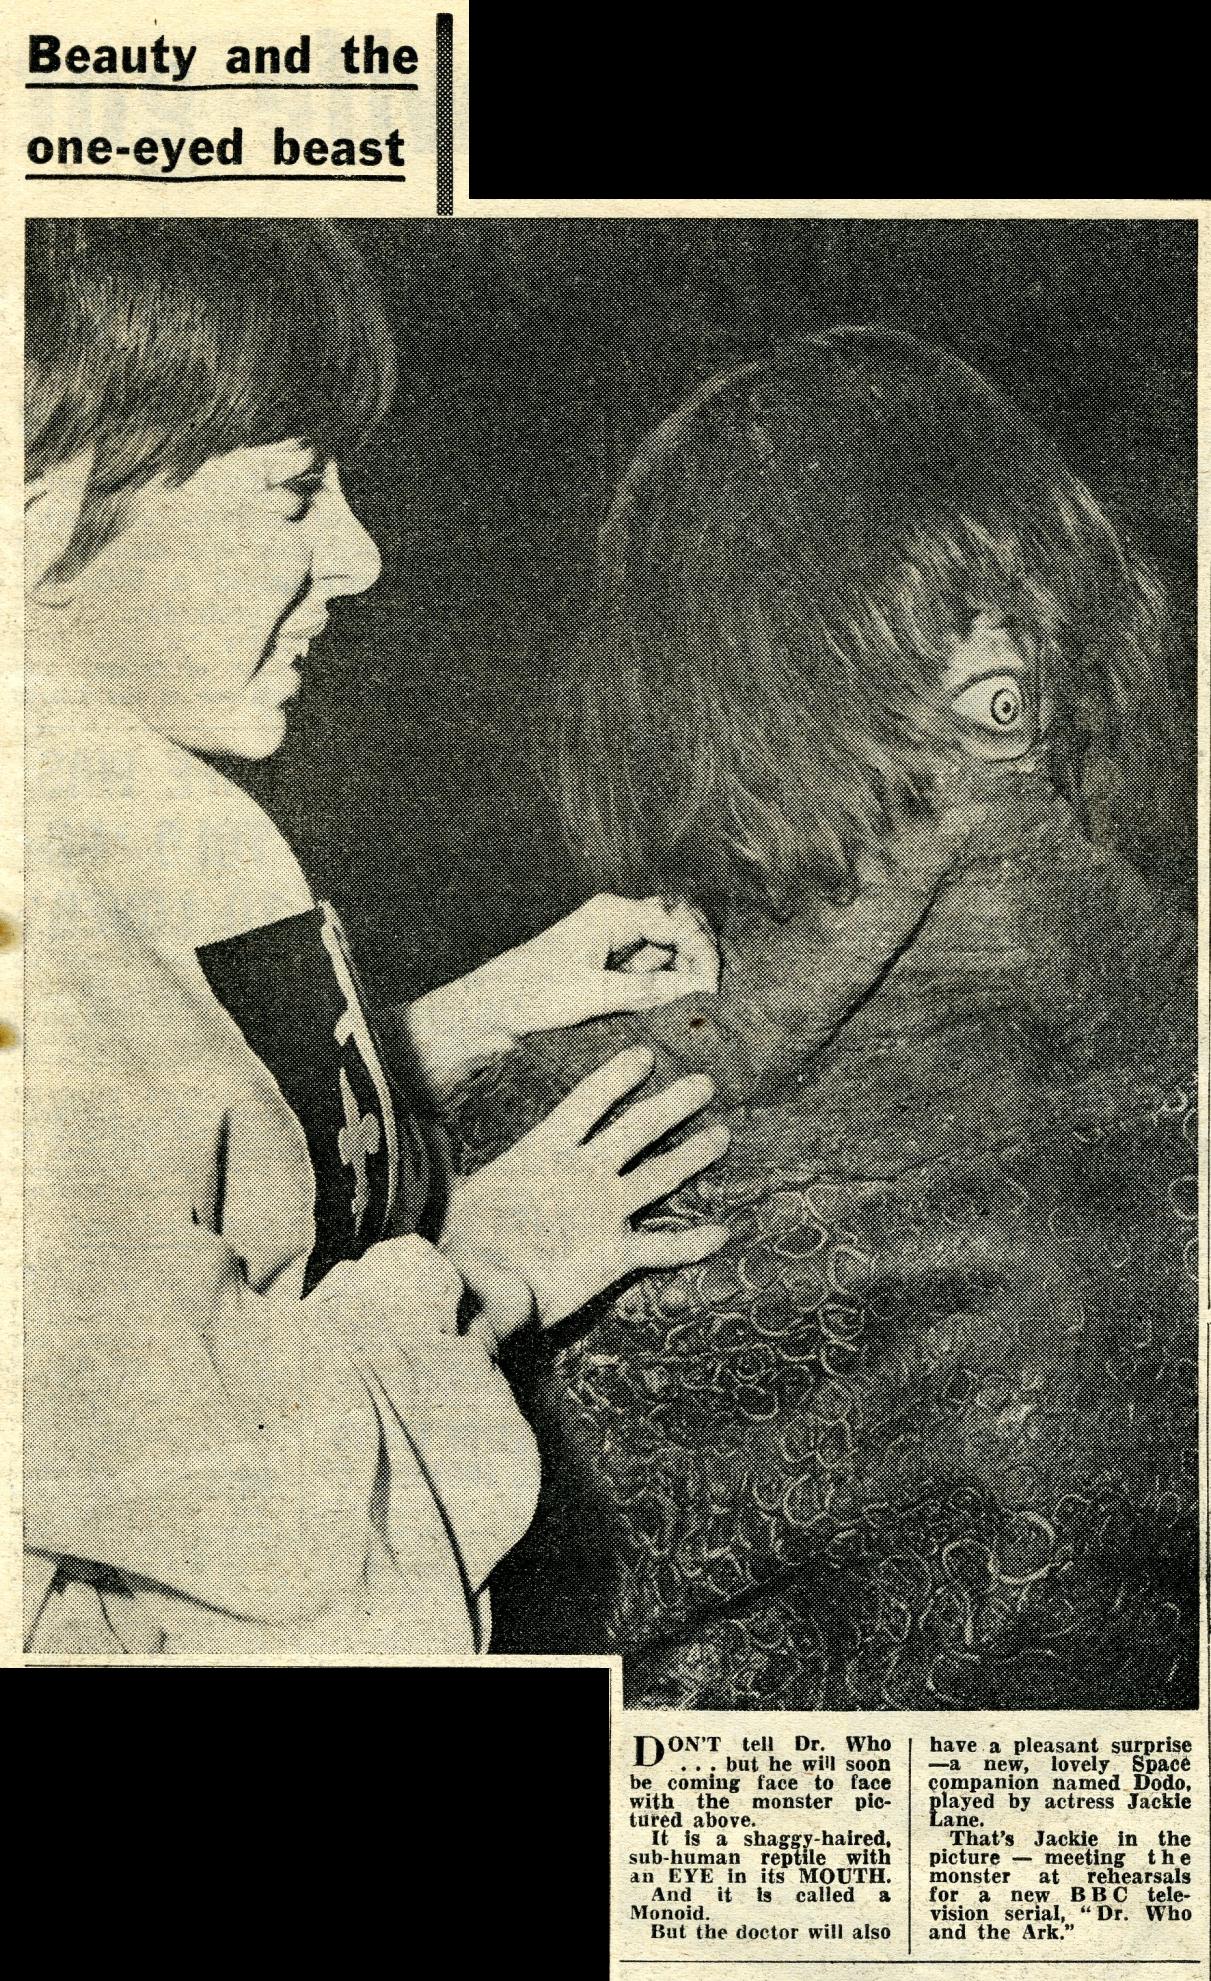 Daily Mirror, 19 February 1966